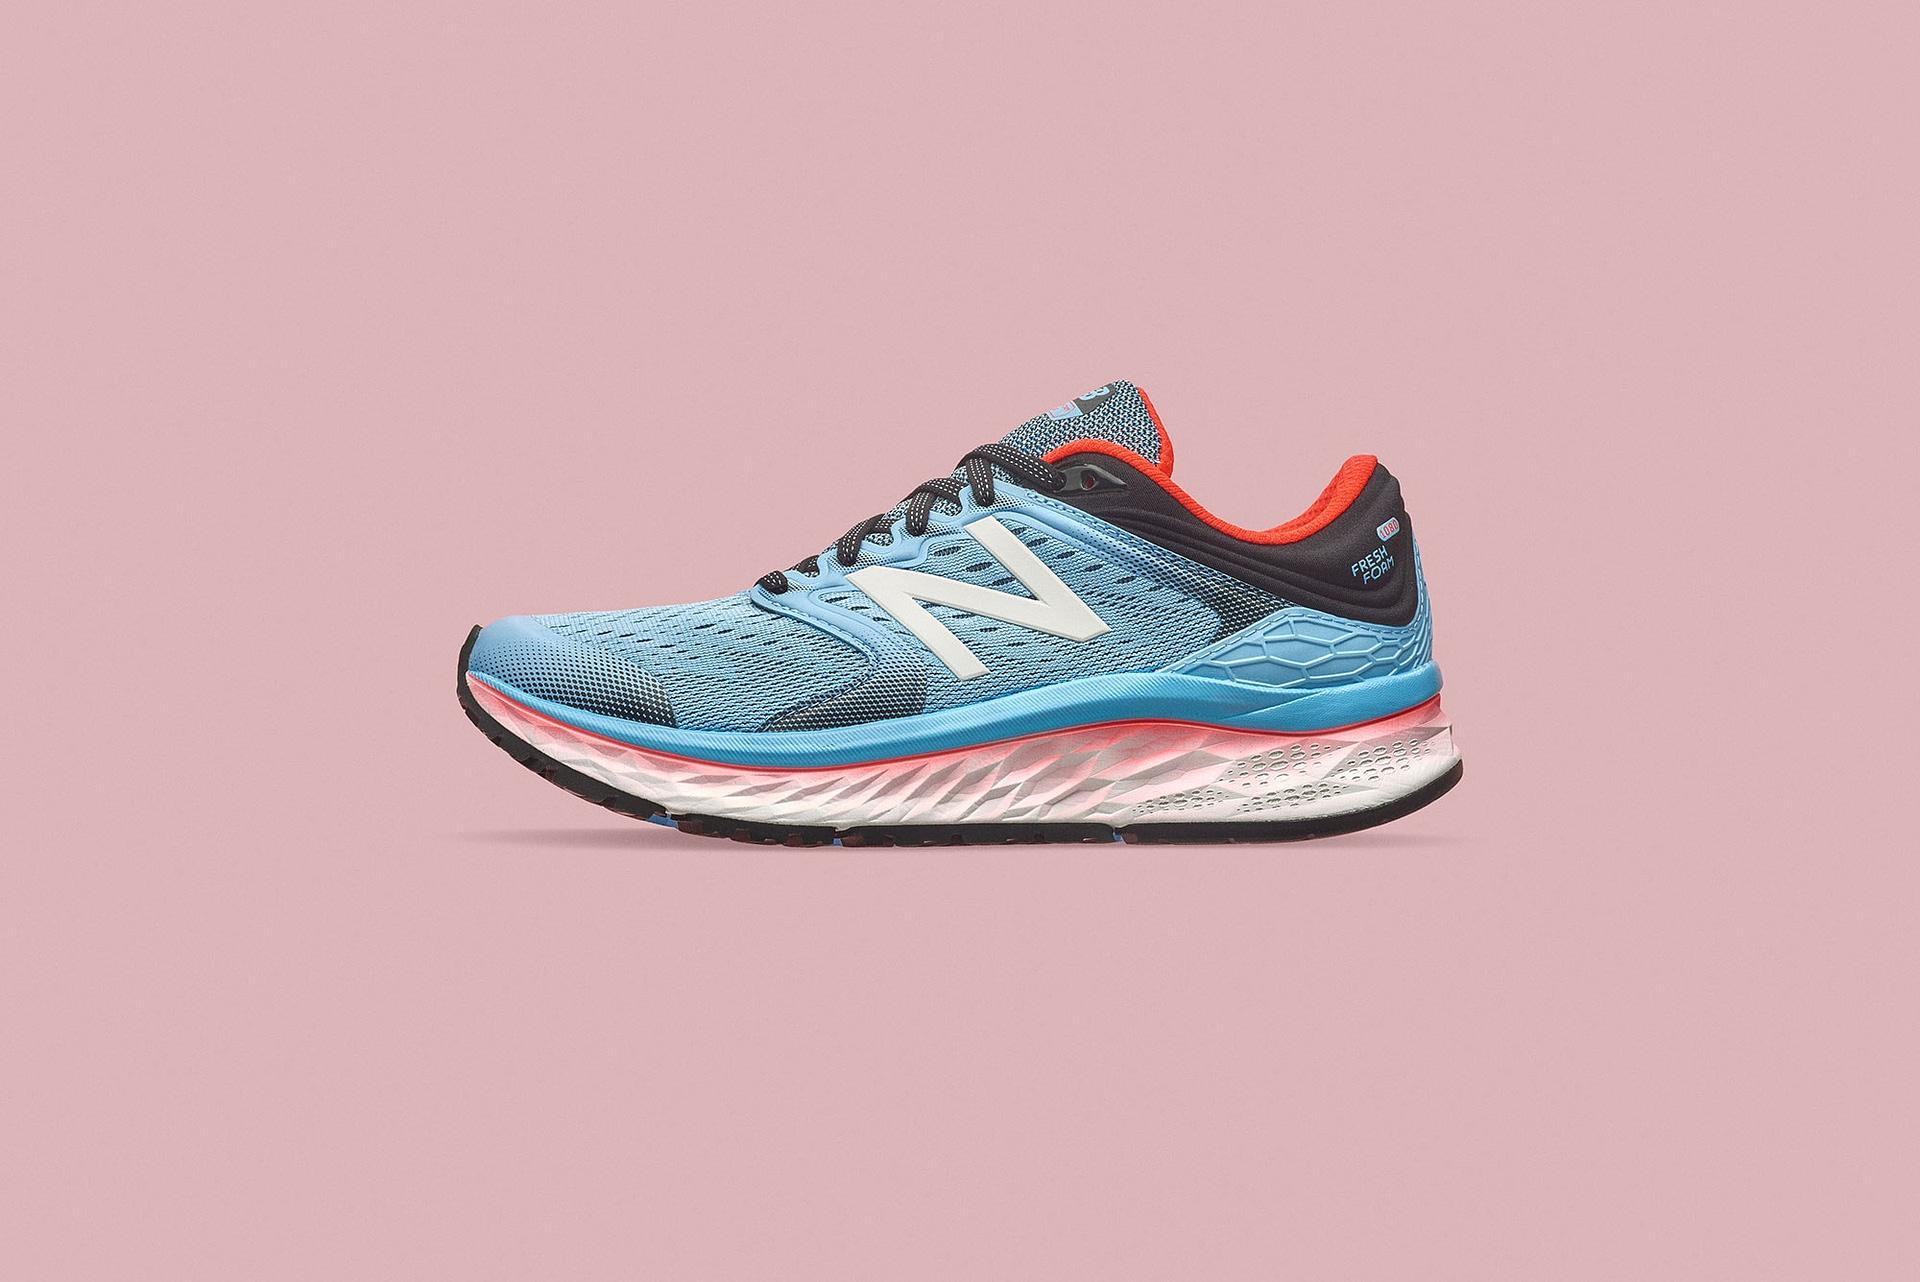 women's new balance running shoe photographed using elinchrom bx500ri lighting